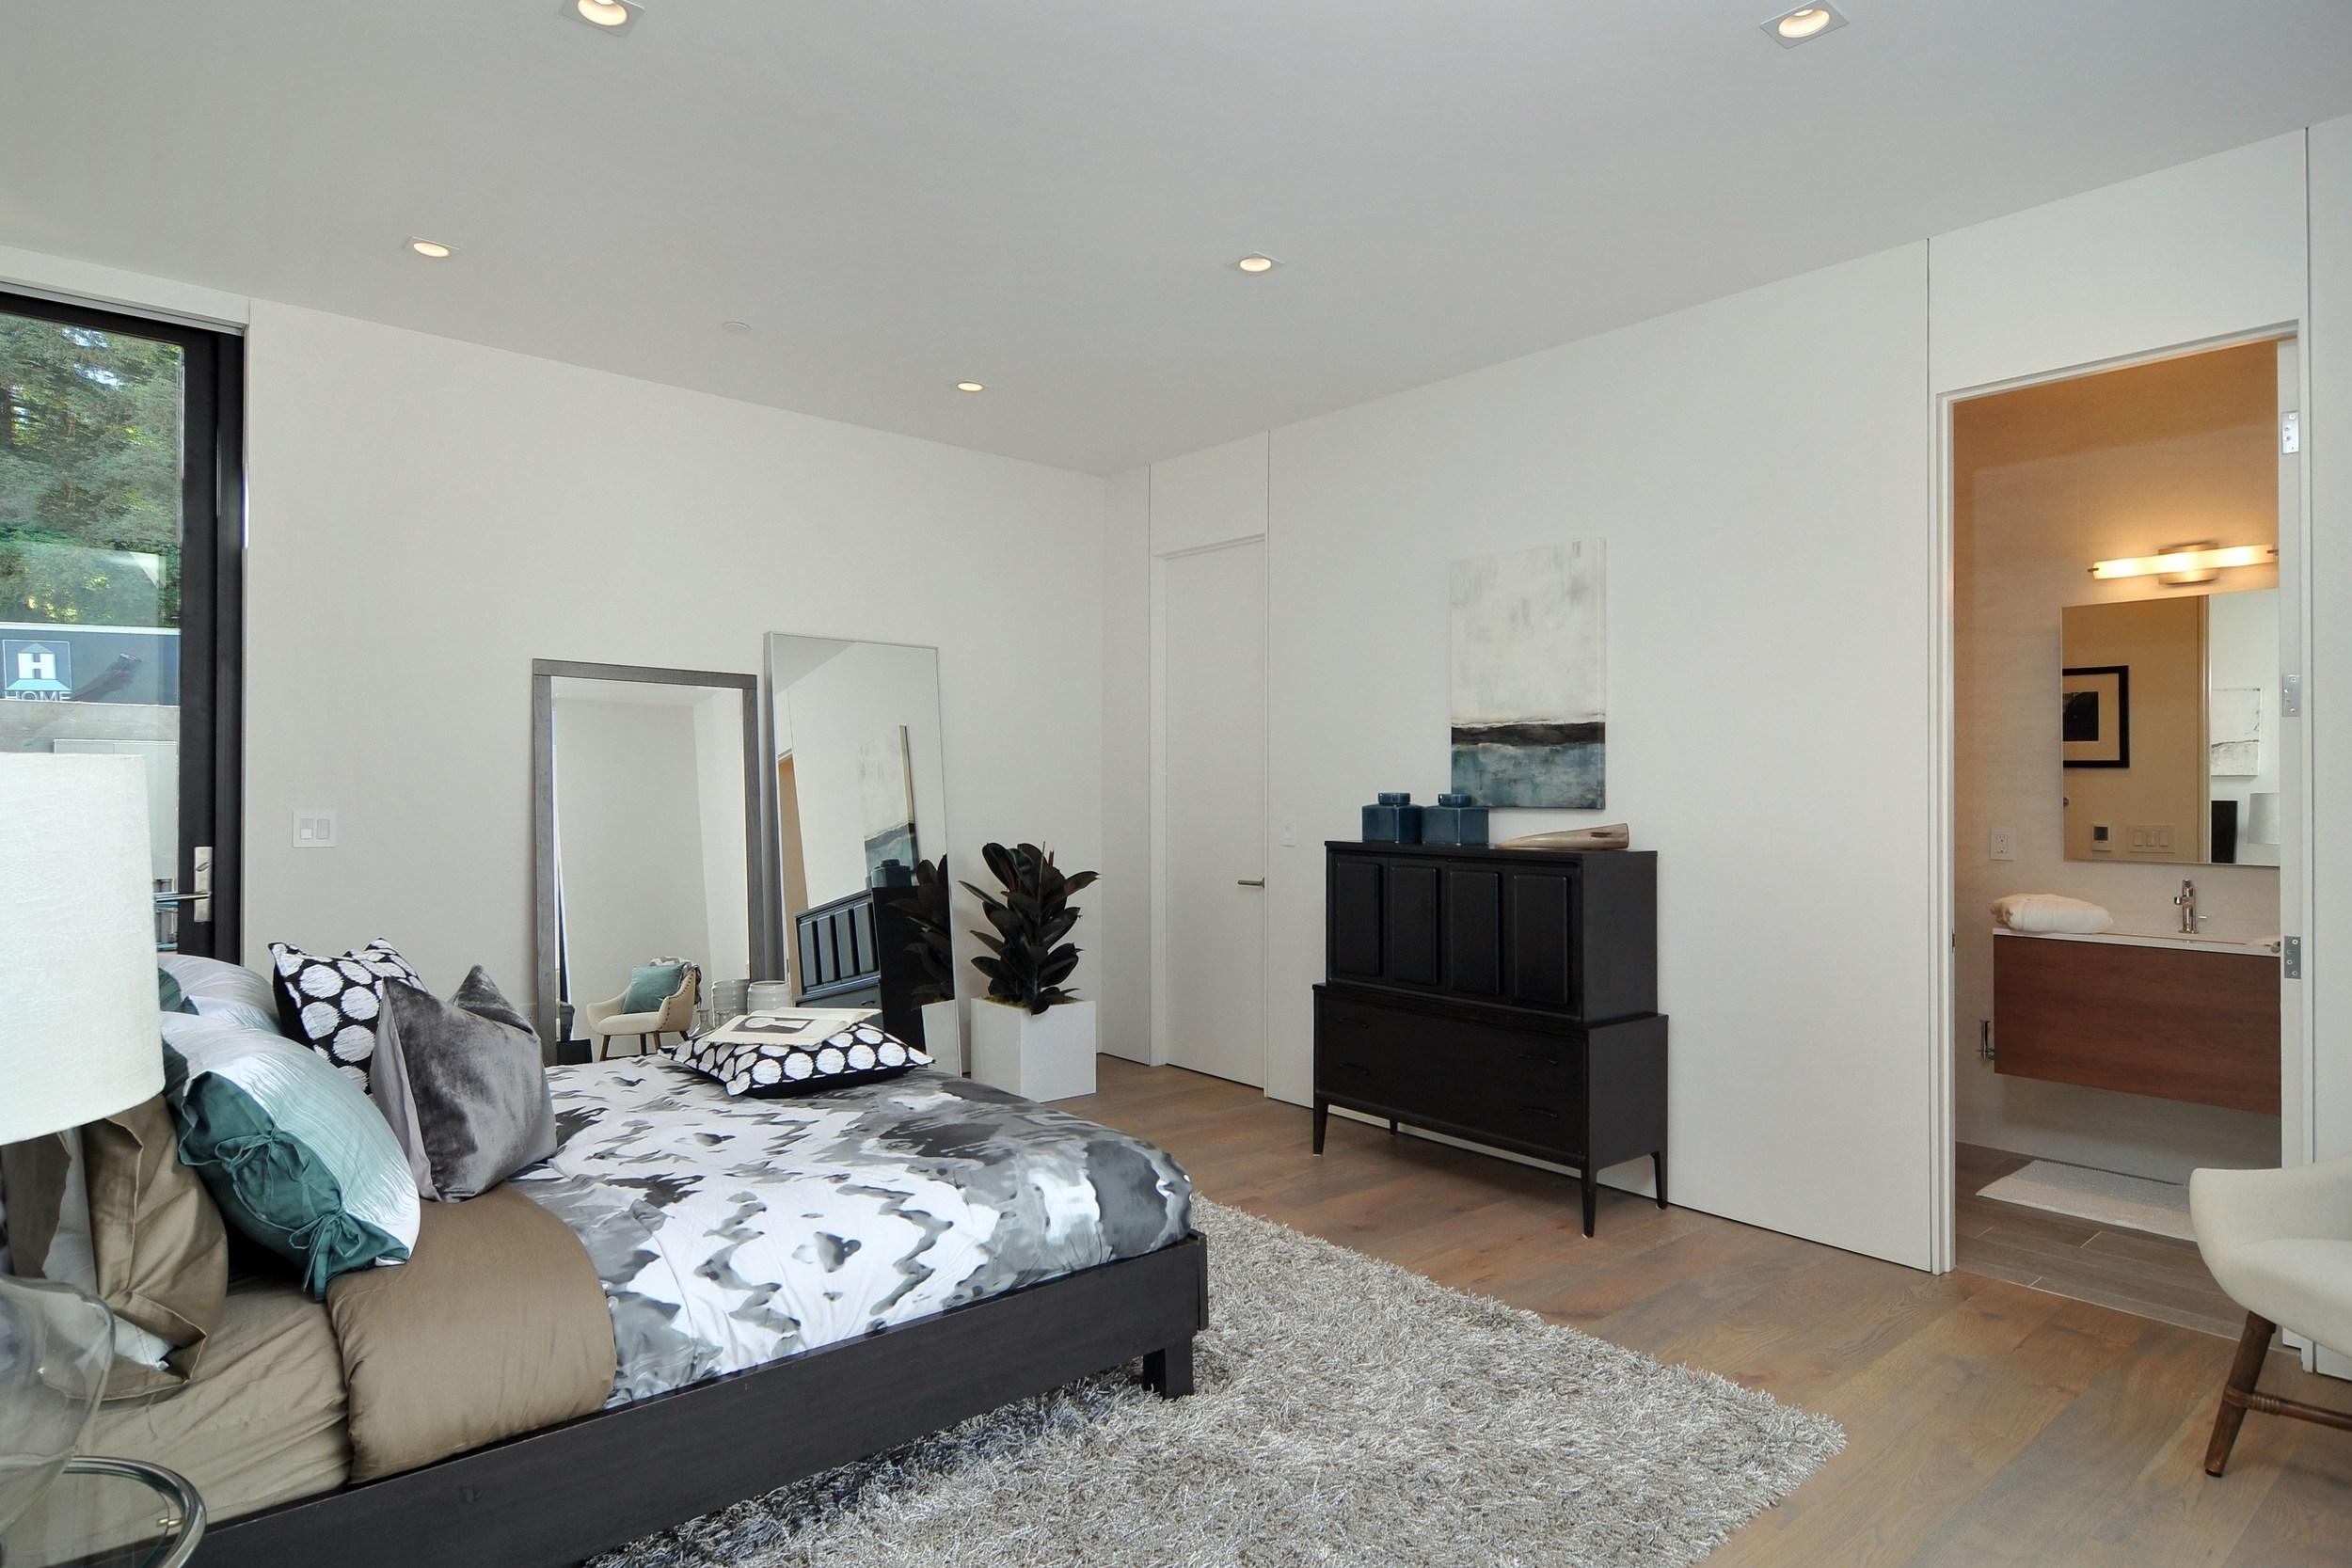 021_Bedroom (1).jpg